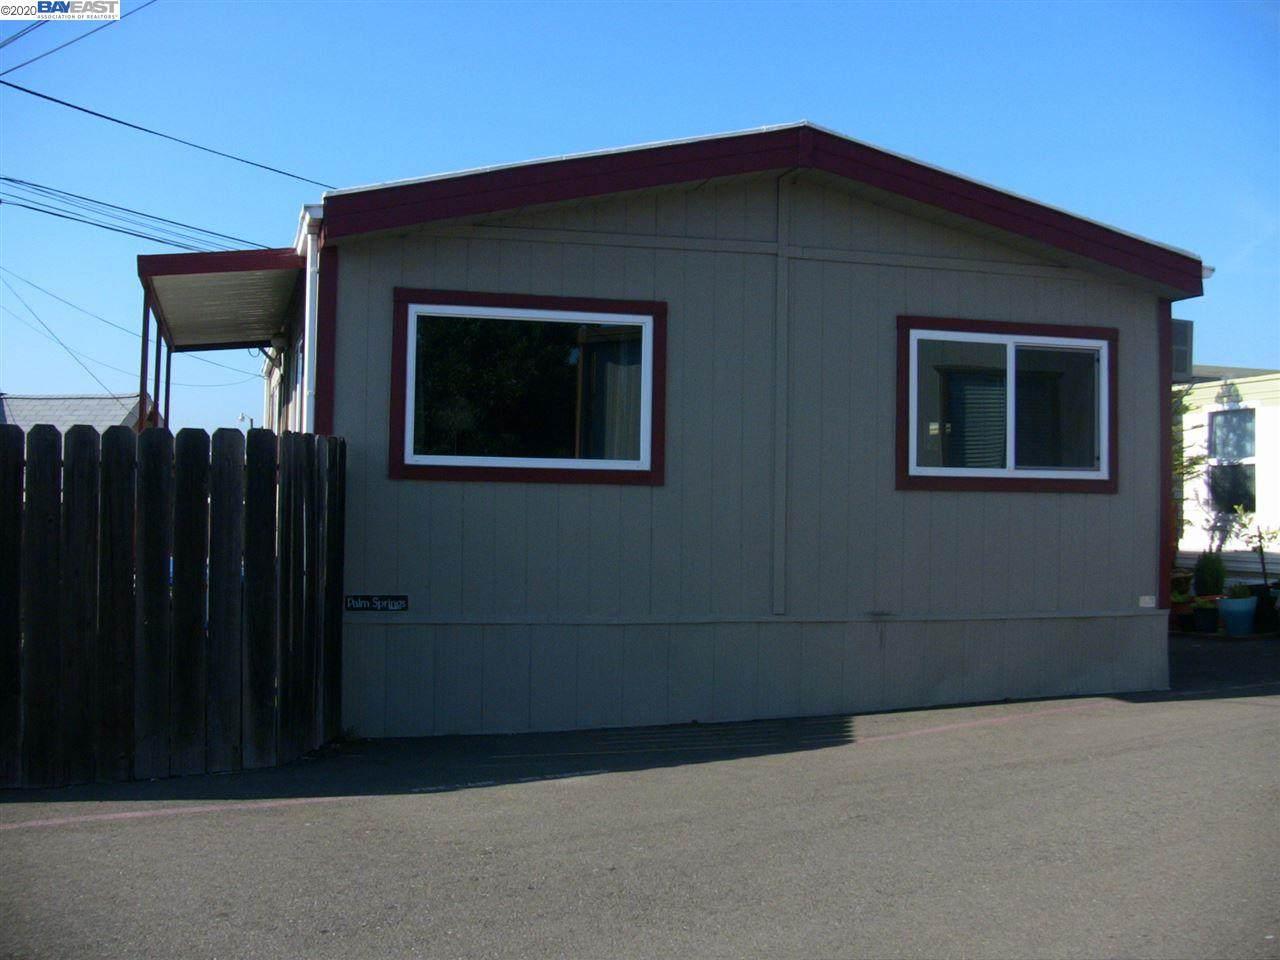 3998 Castro Valley Blvd 36 - Photo 1